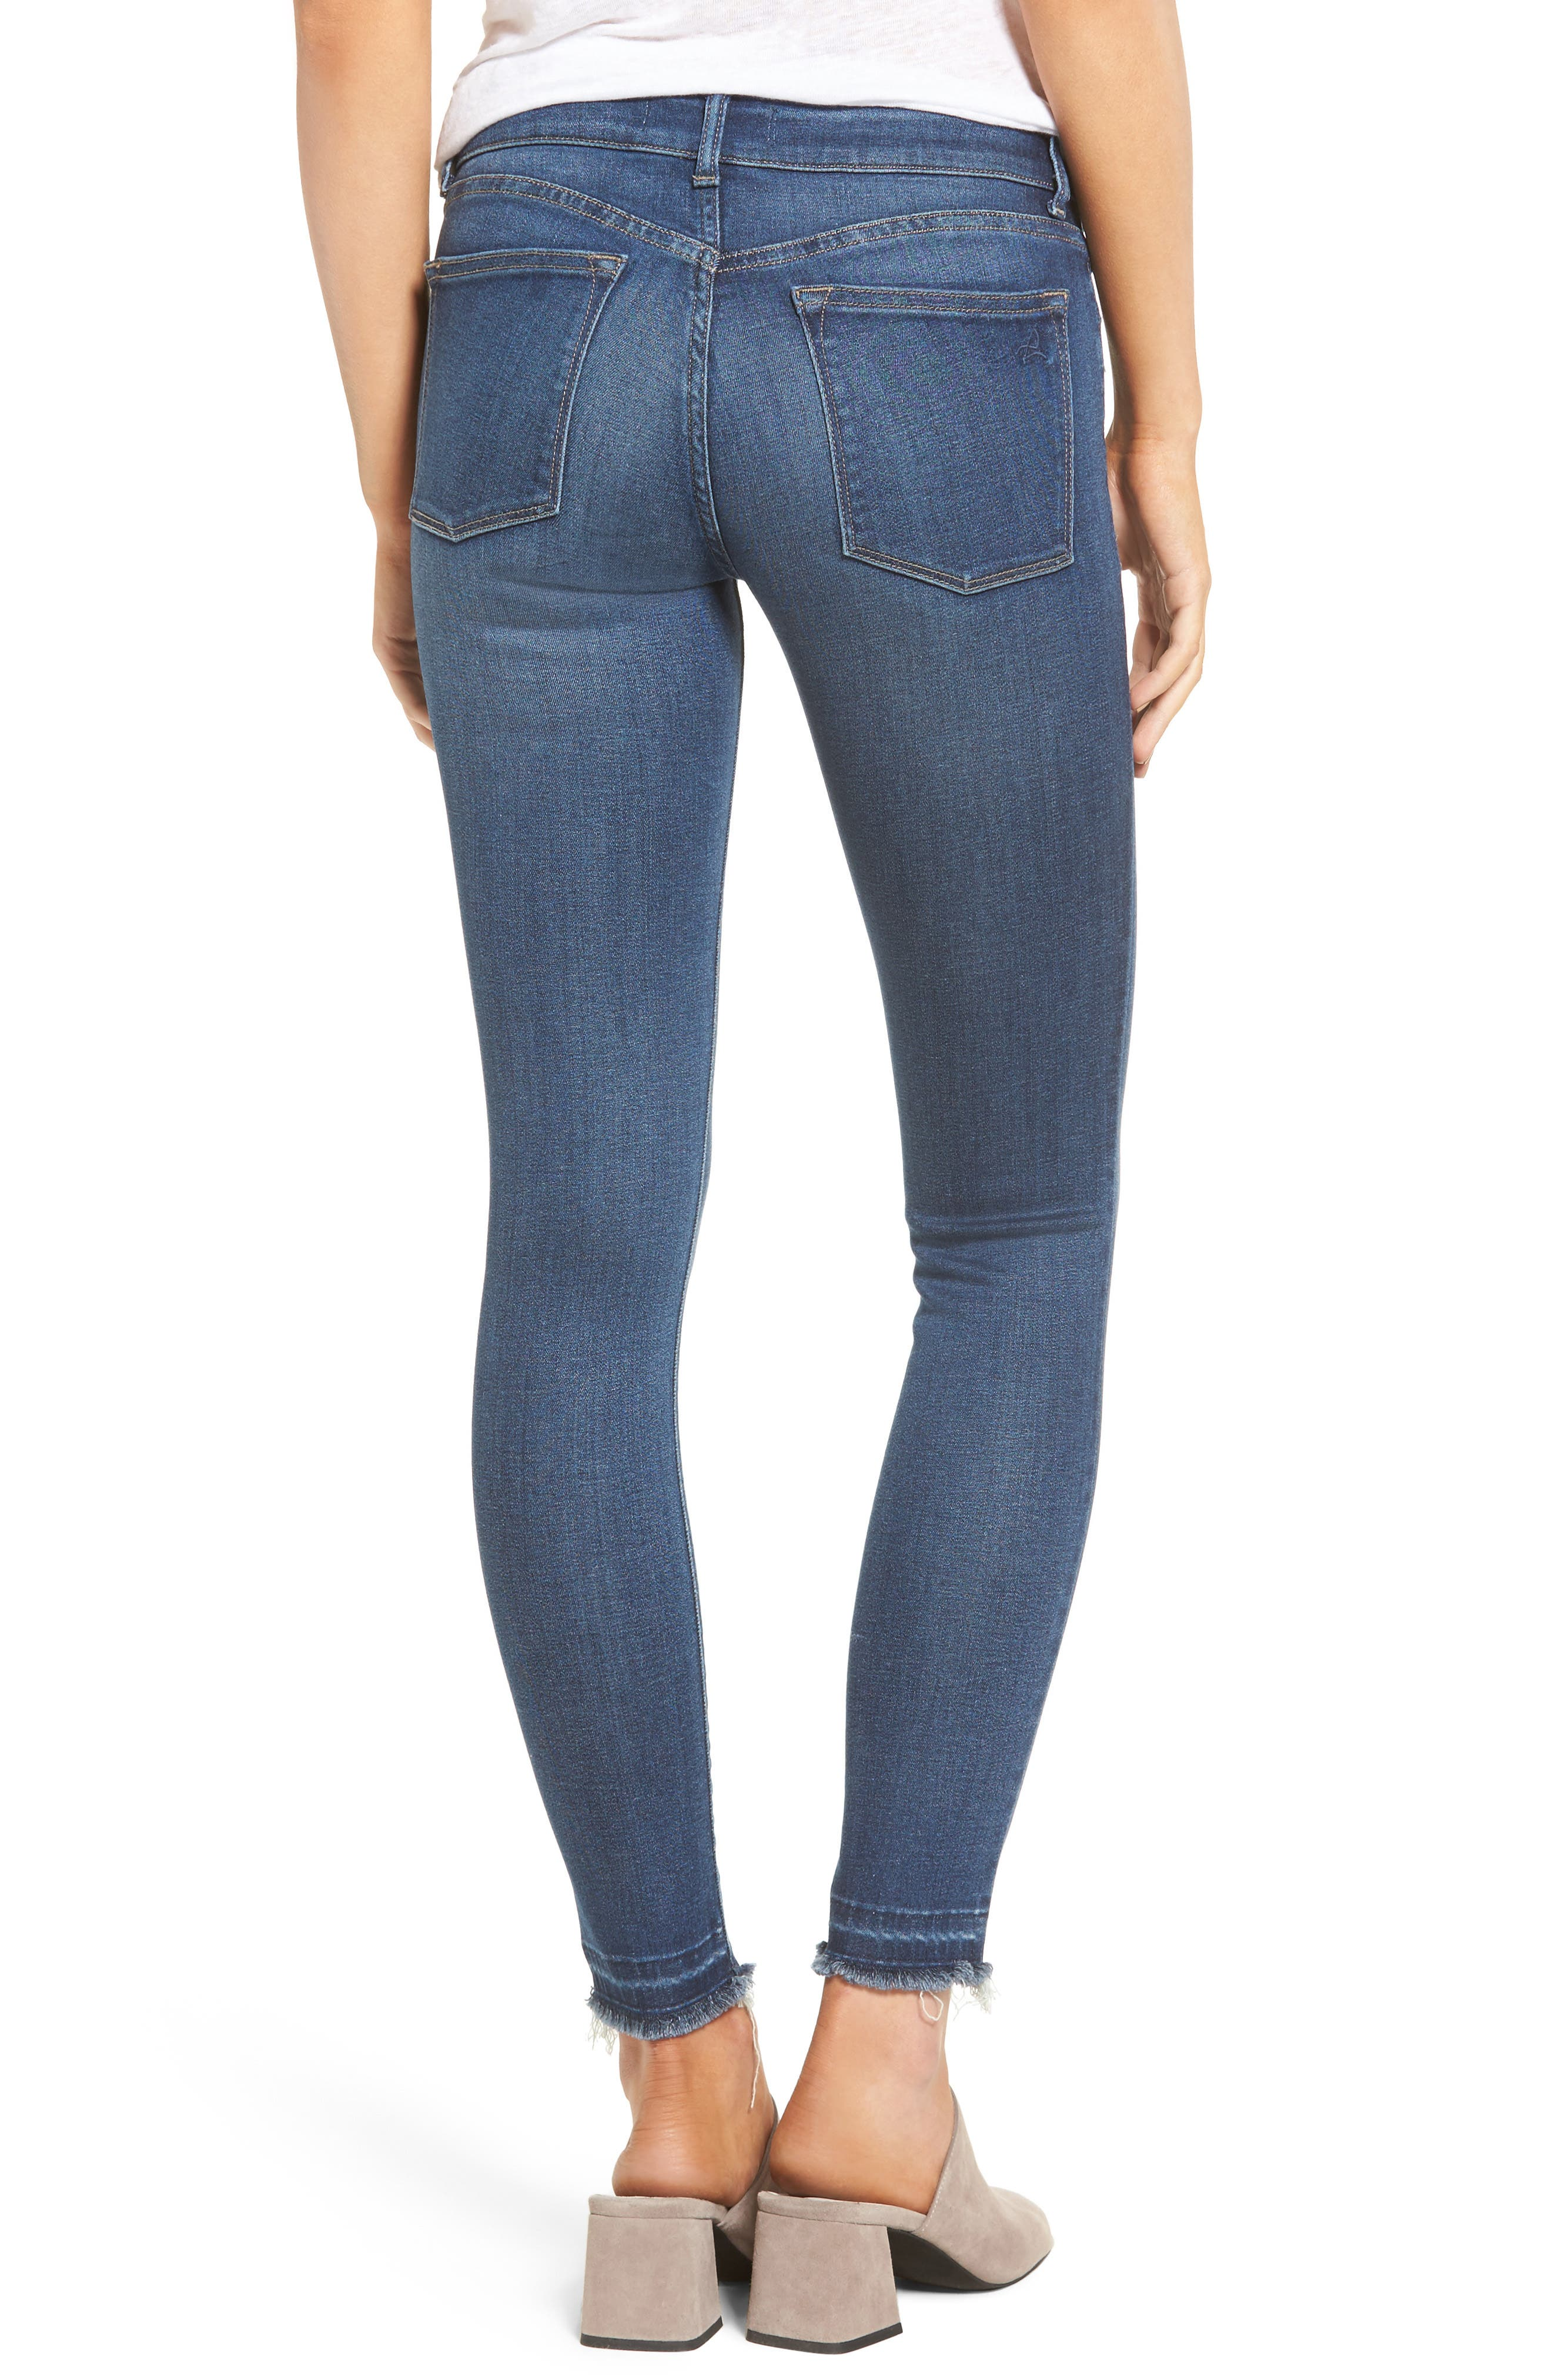 Emma Power Legging Jeans,                             Alternate thumbnail 2, color,                             405